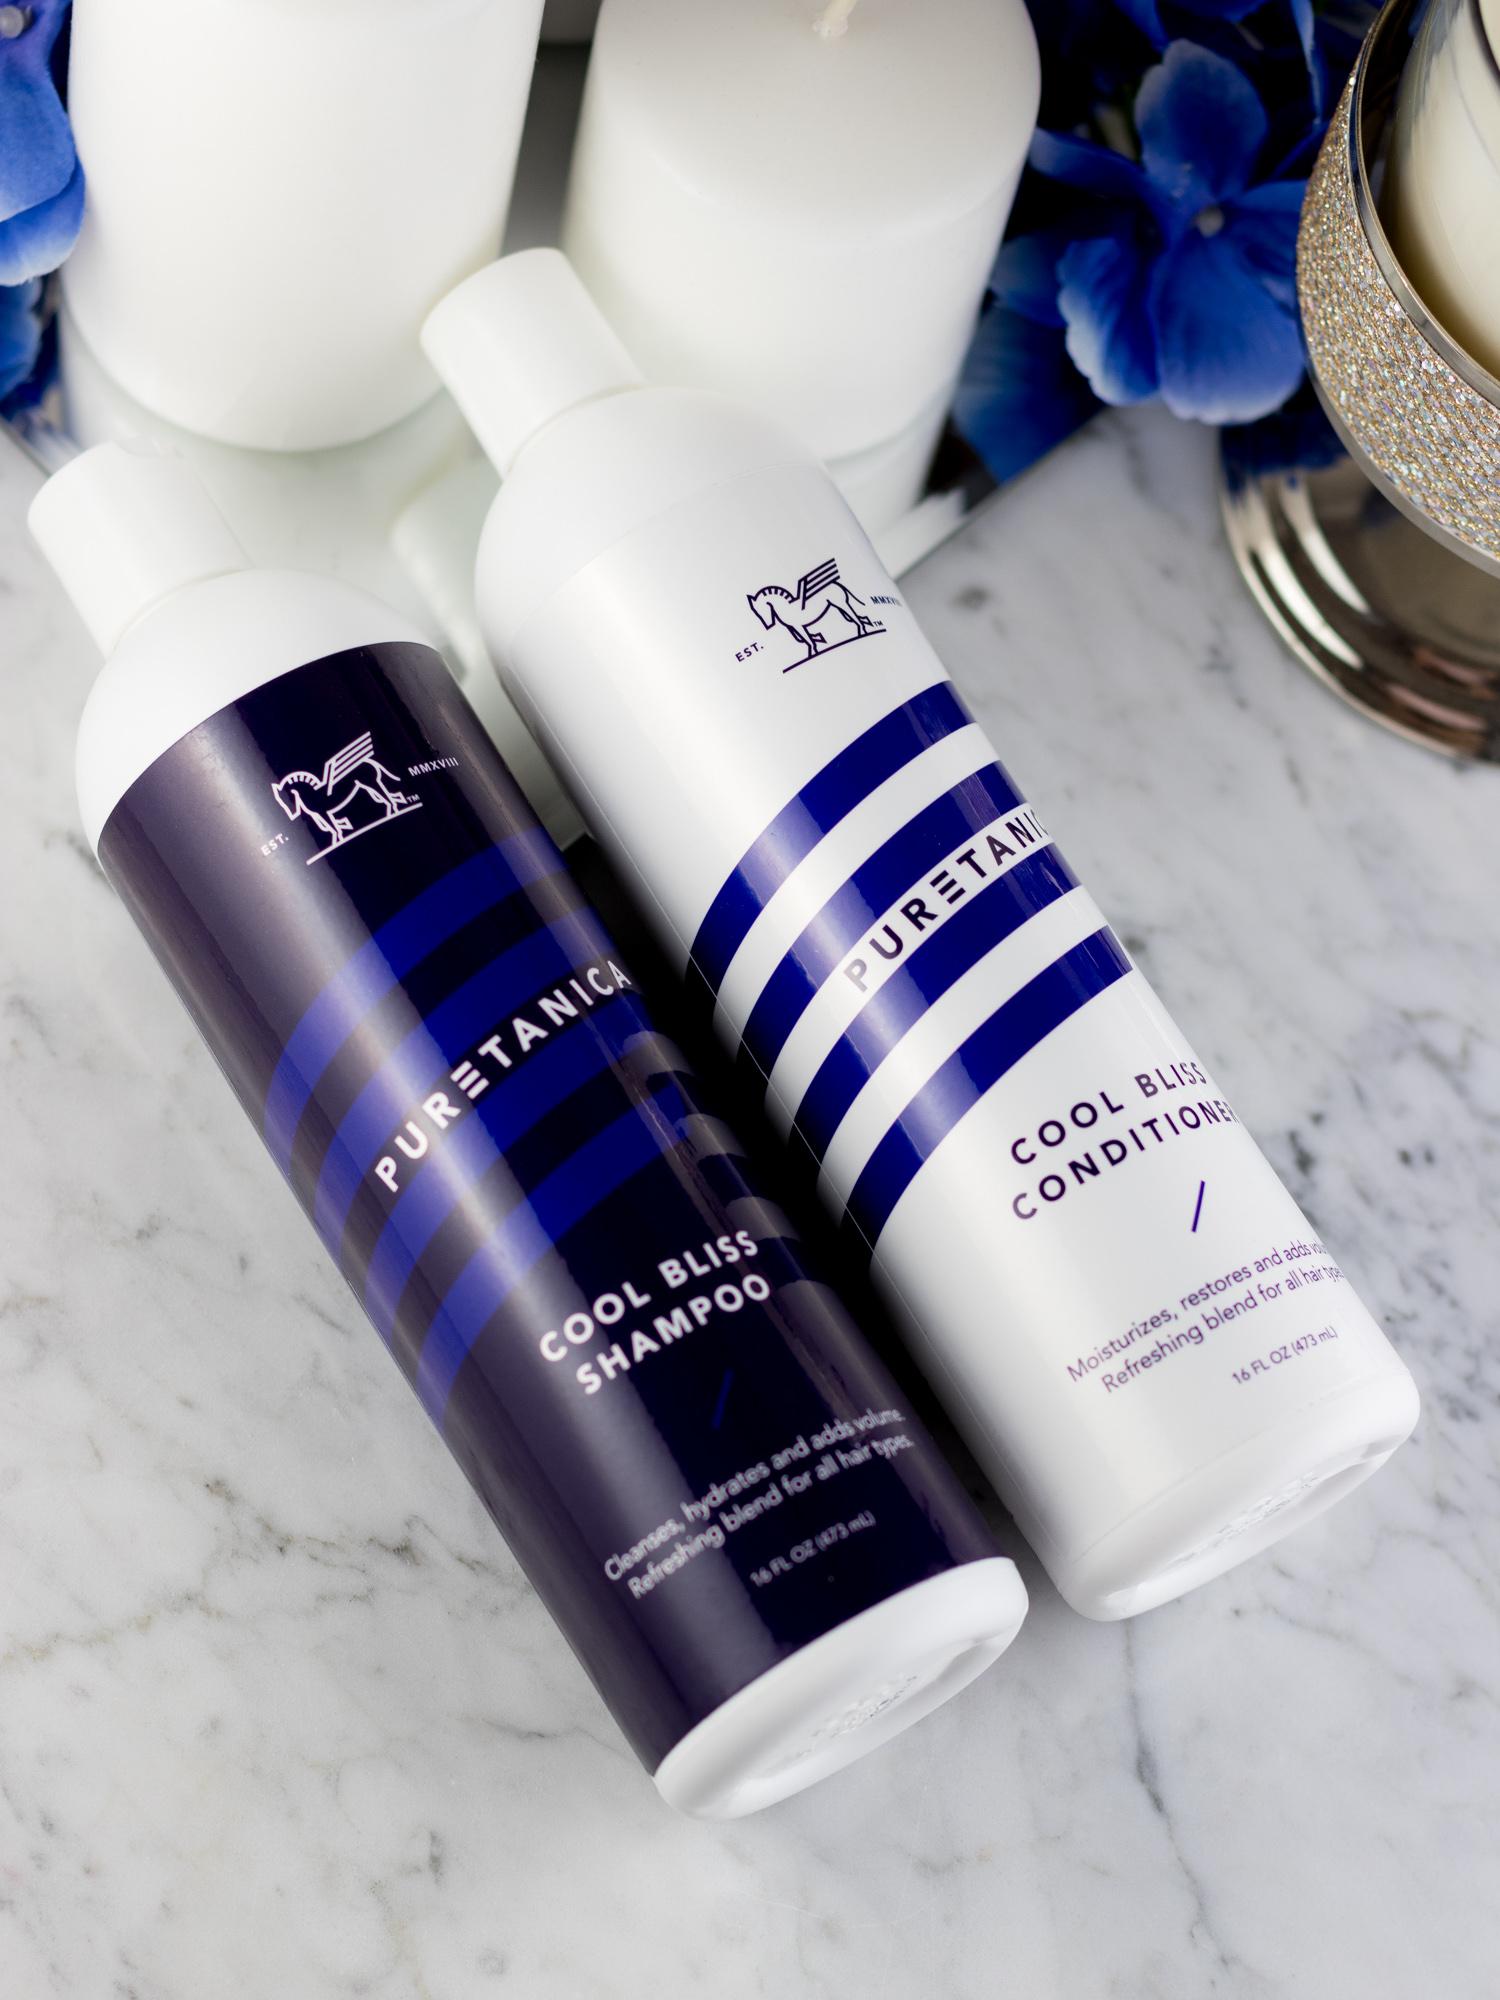 Puretanica Cool Bliss Shampoo & Conditioner